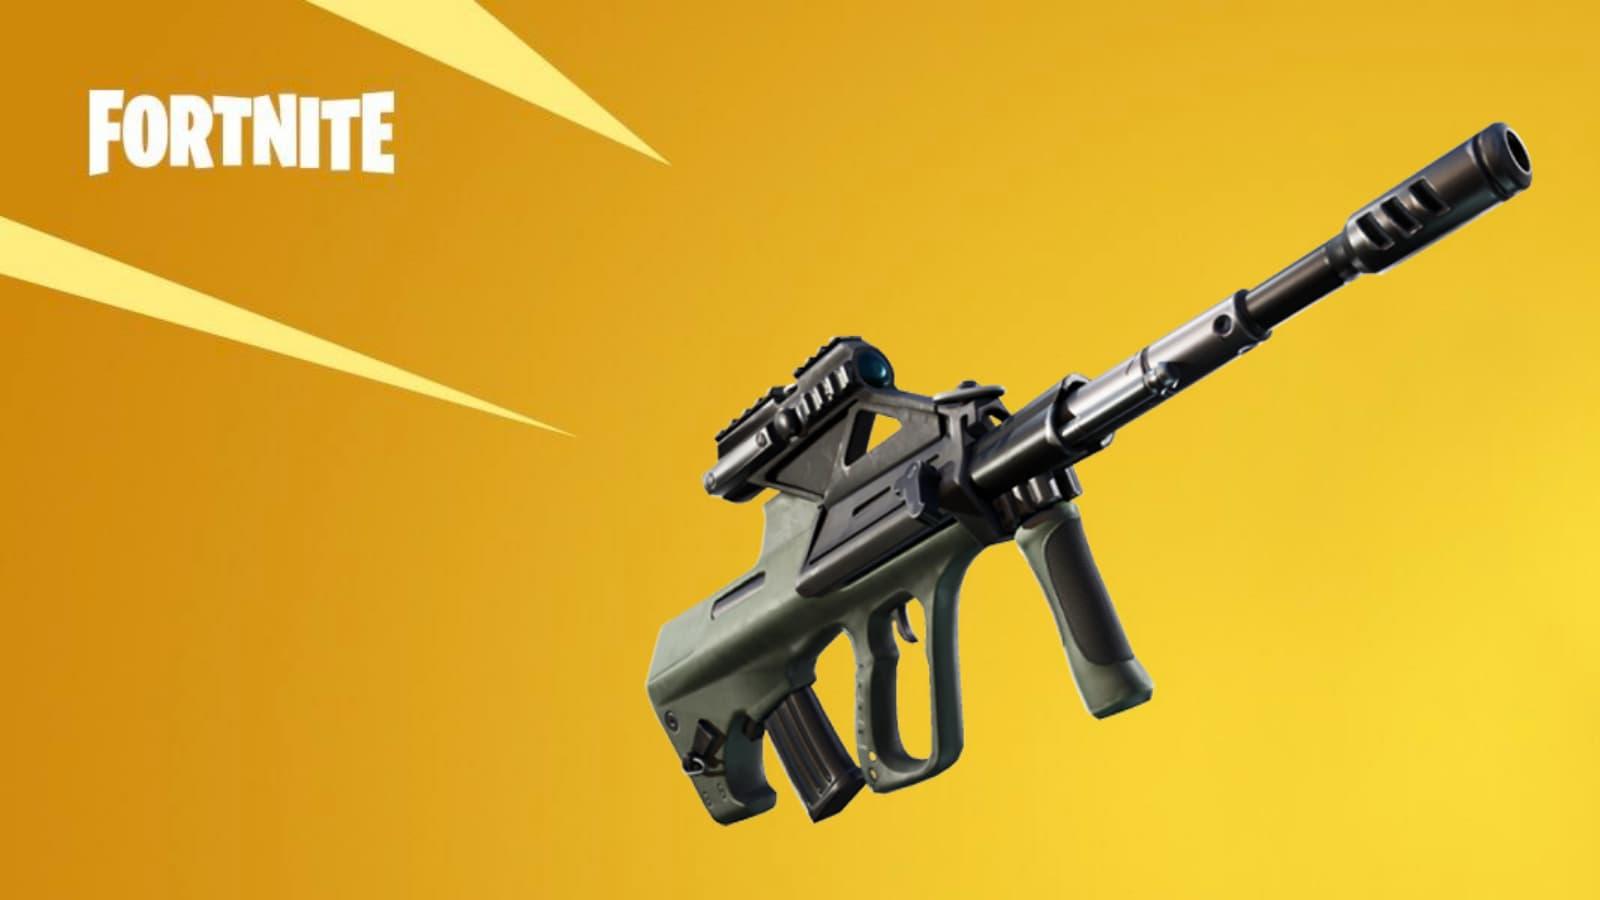 Fortnite Best Rifles: Top 5 Best Guns to Use till Season 7